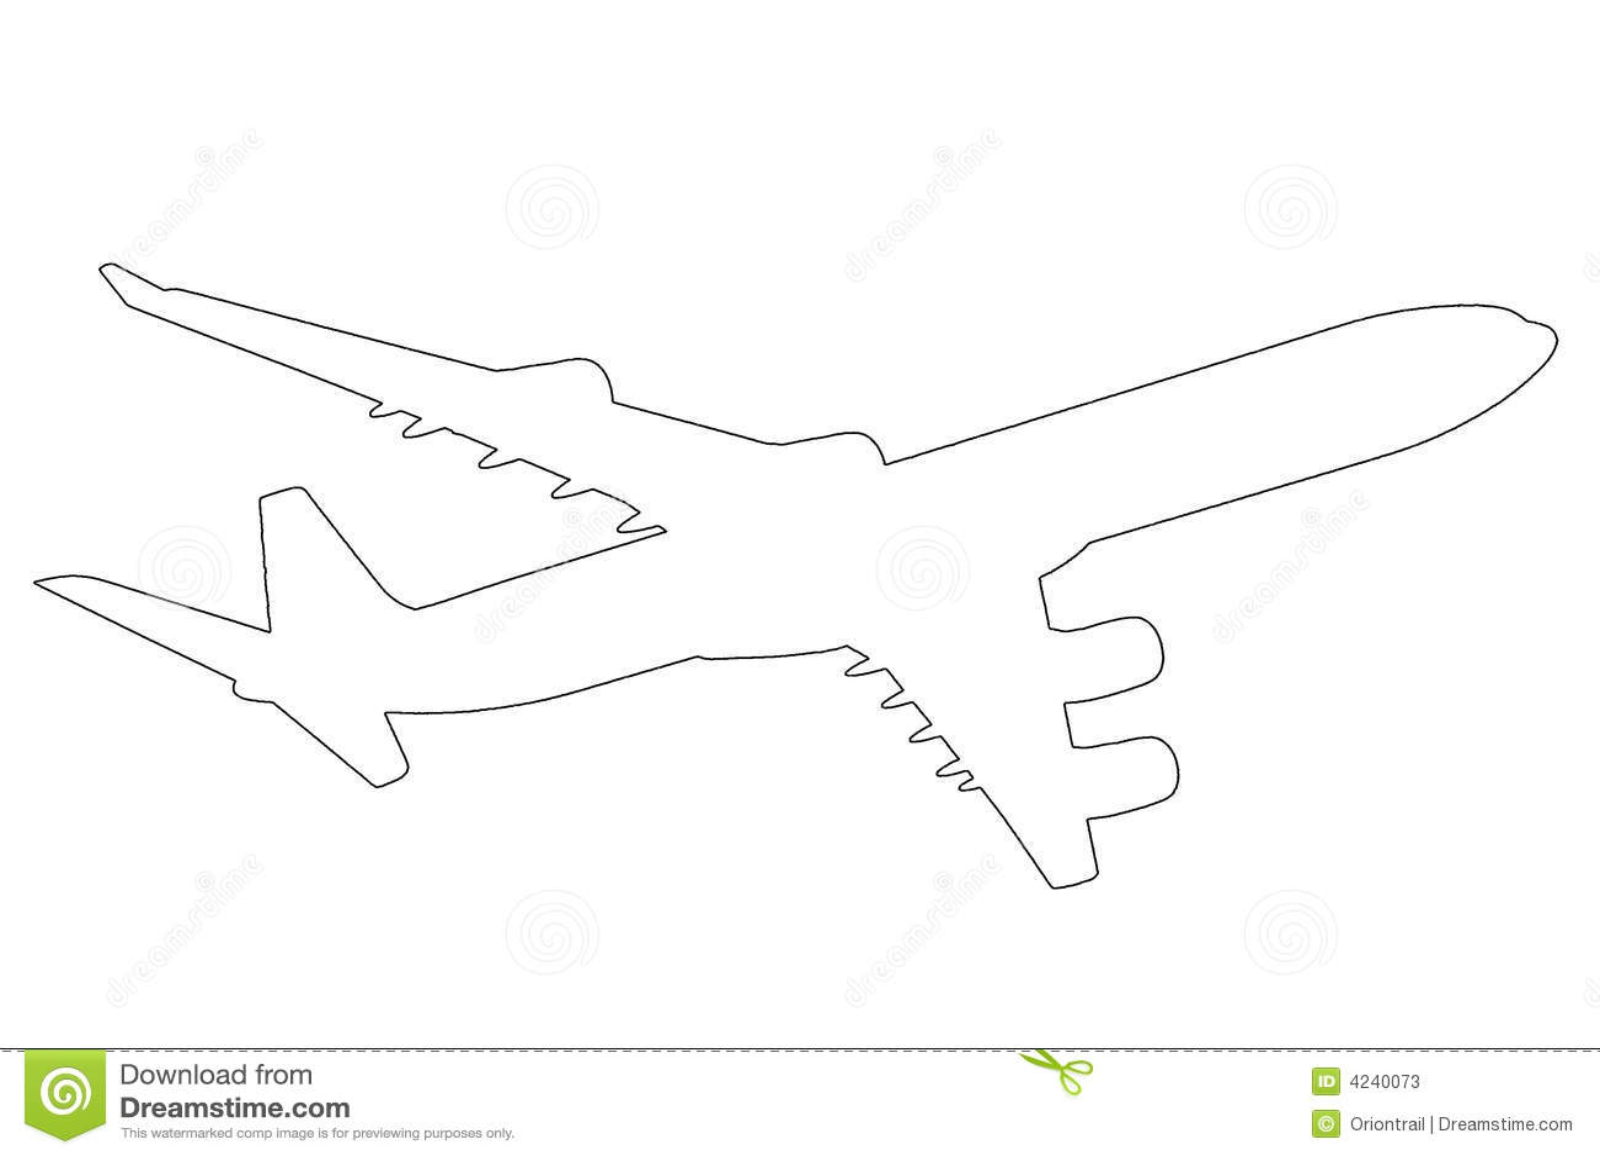 Airplane Outline Illustration Stock Photos